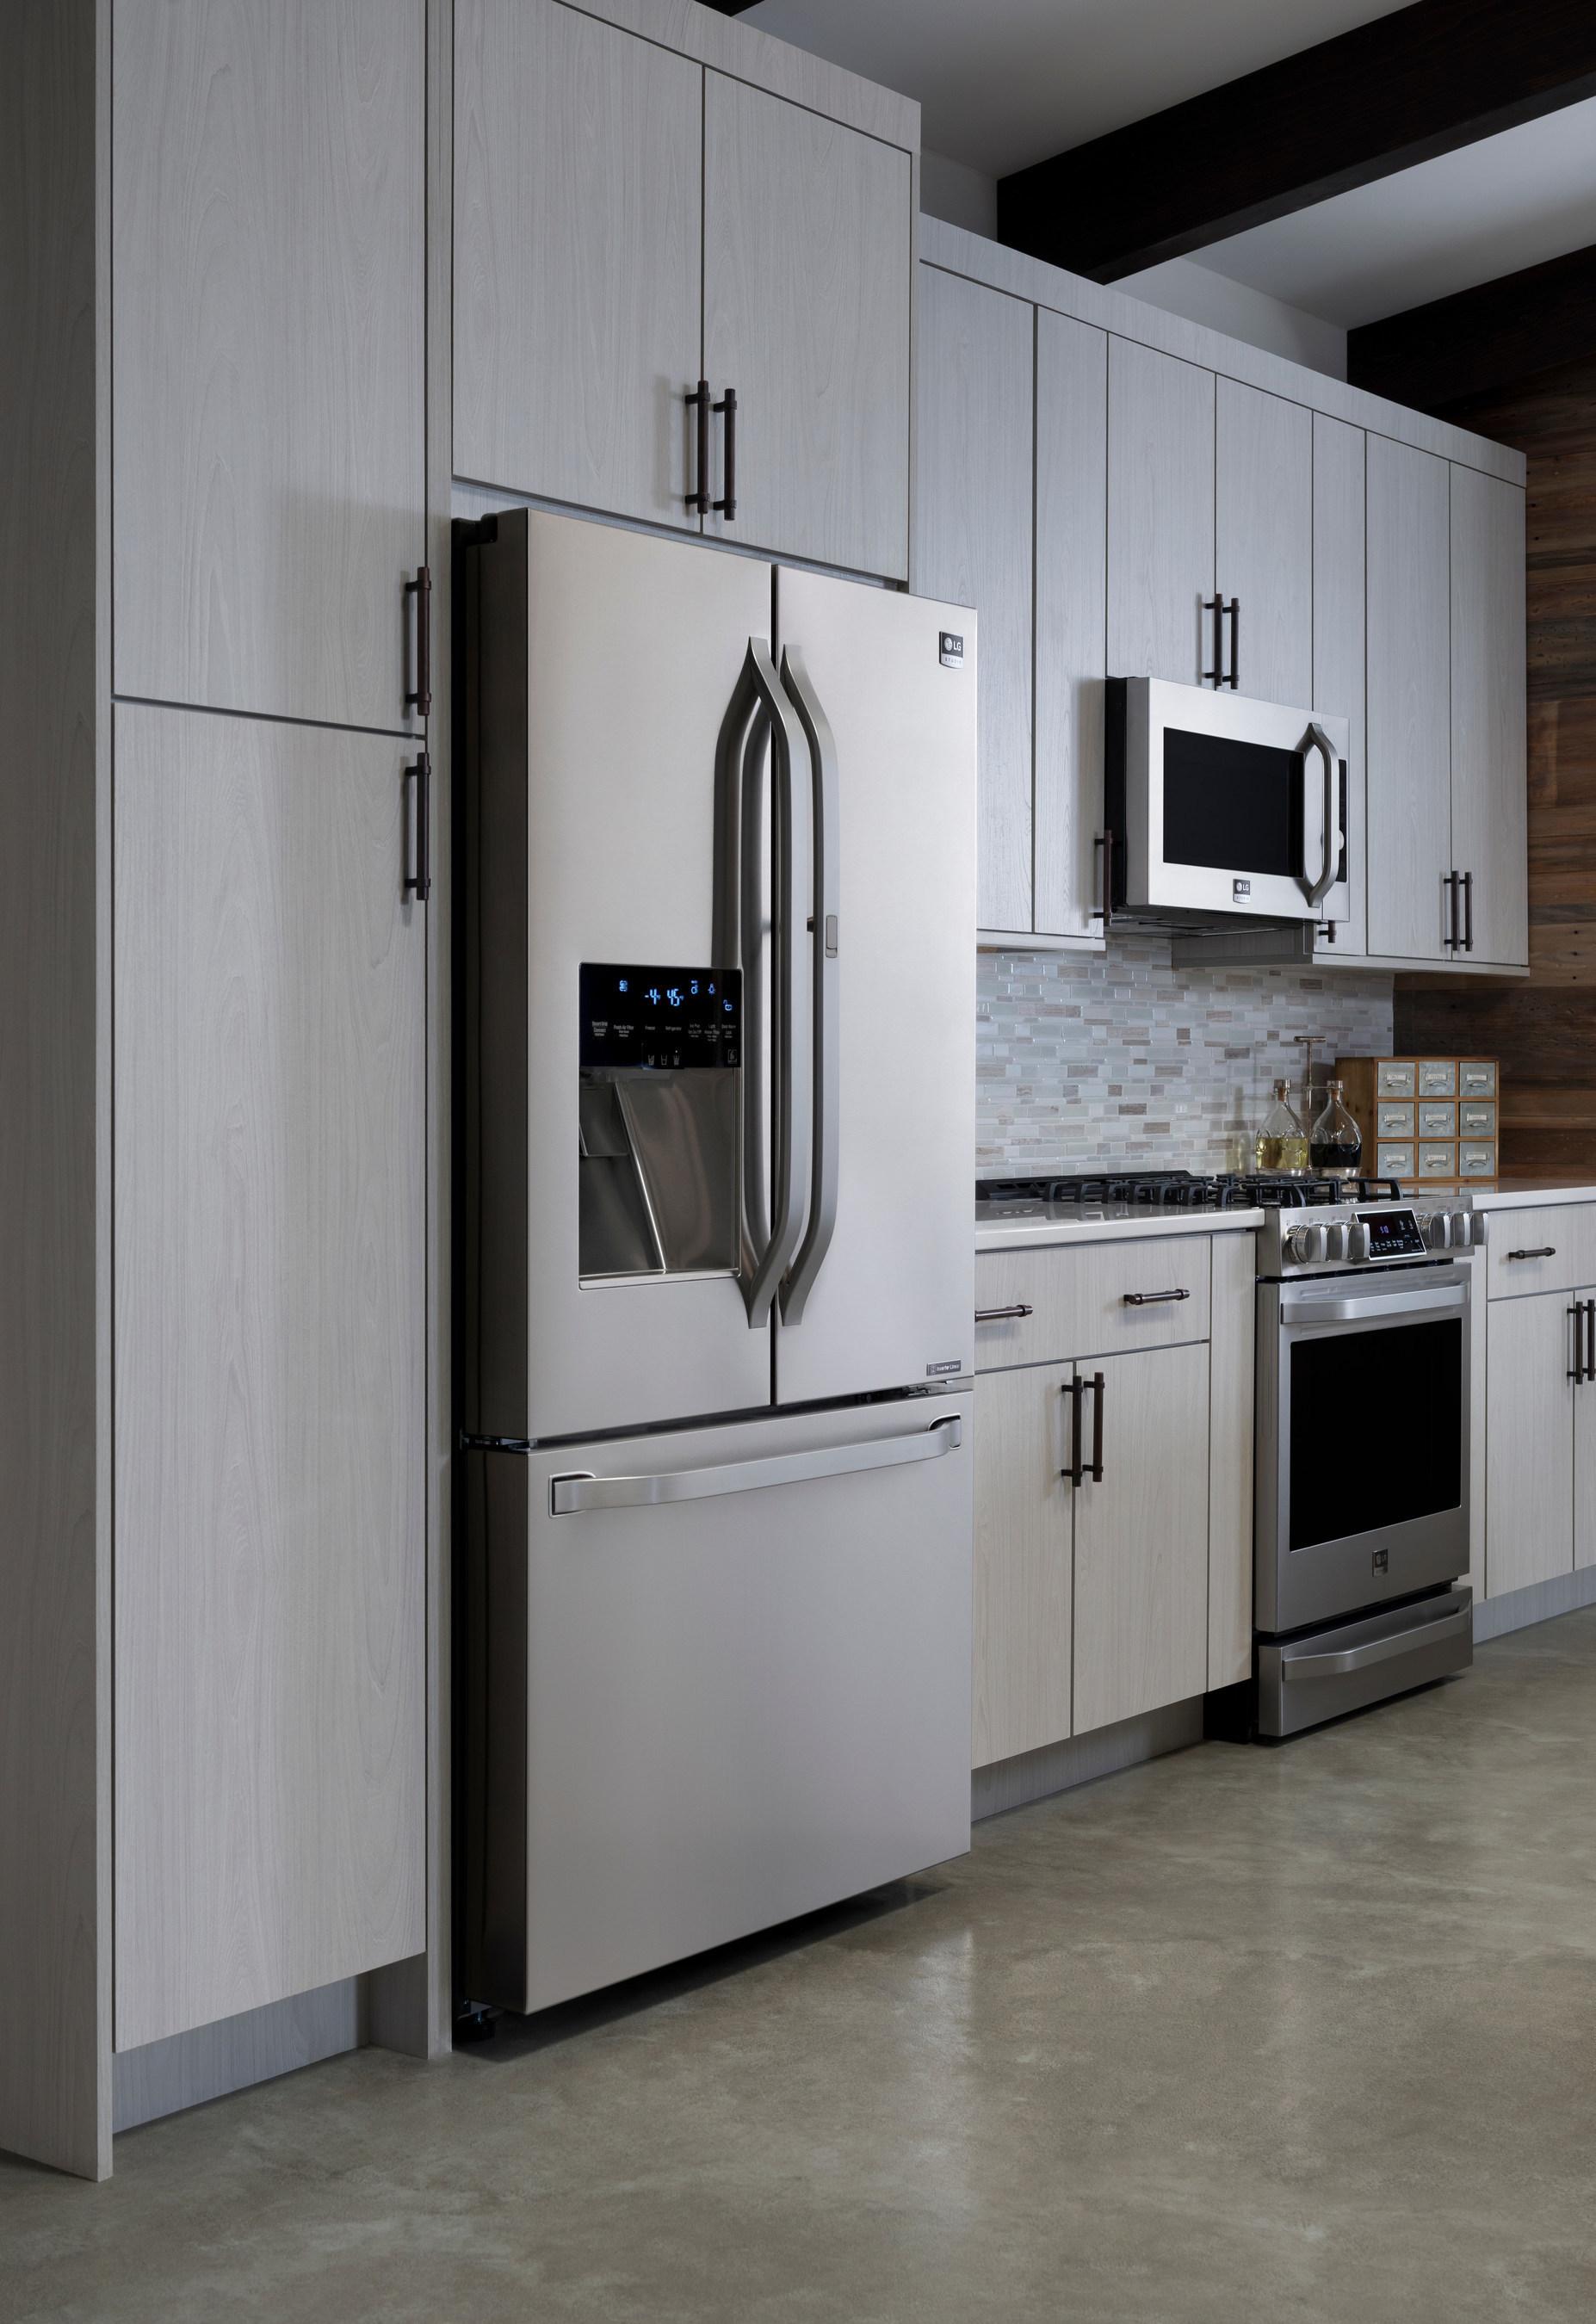 LG Studiou0027s Artistic Advisor And Renowned Interior Designer Nate Berkus Has  Inspired The Design Of The